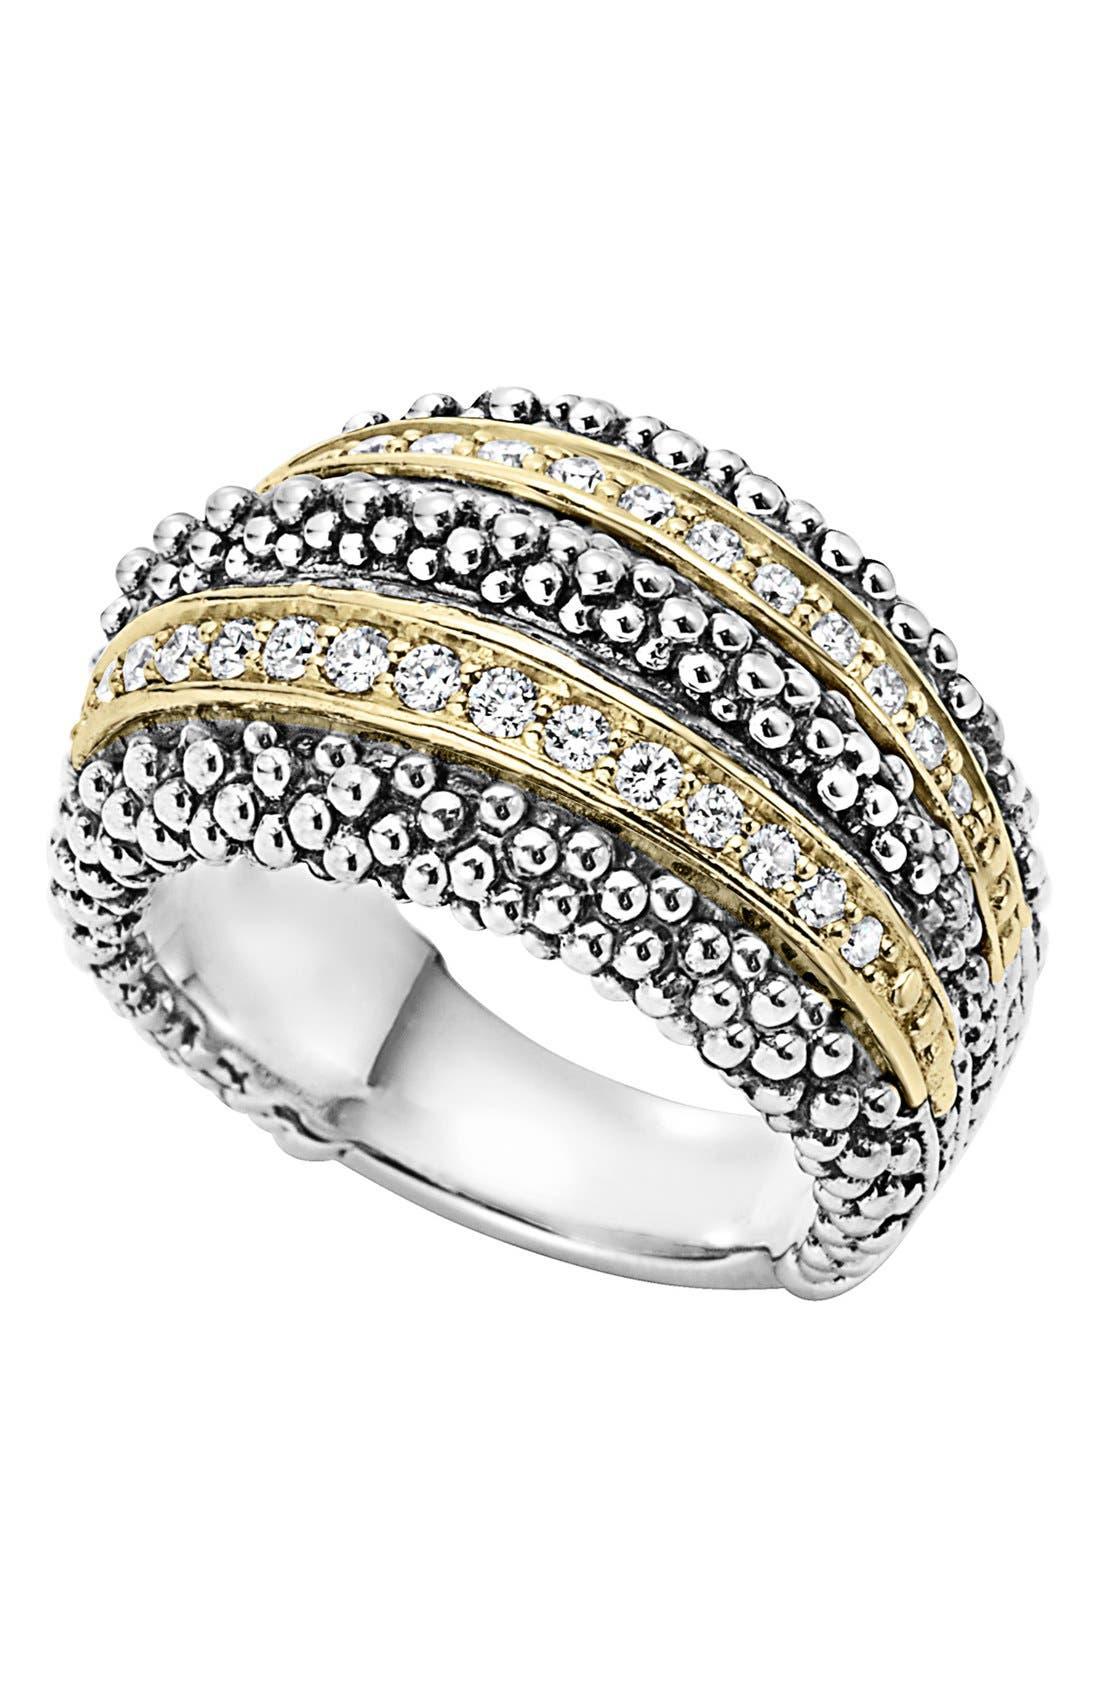 Diamond Caviar Beaded Ring,                             Main thumbnail 1, color,                             SILVER/ GOLD